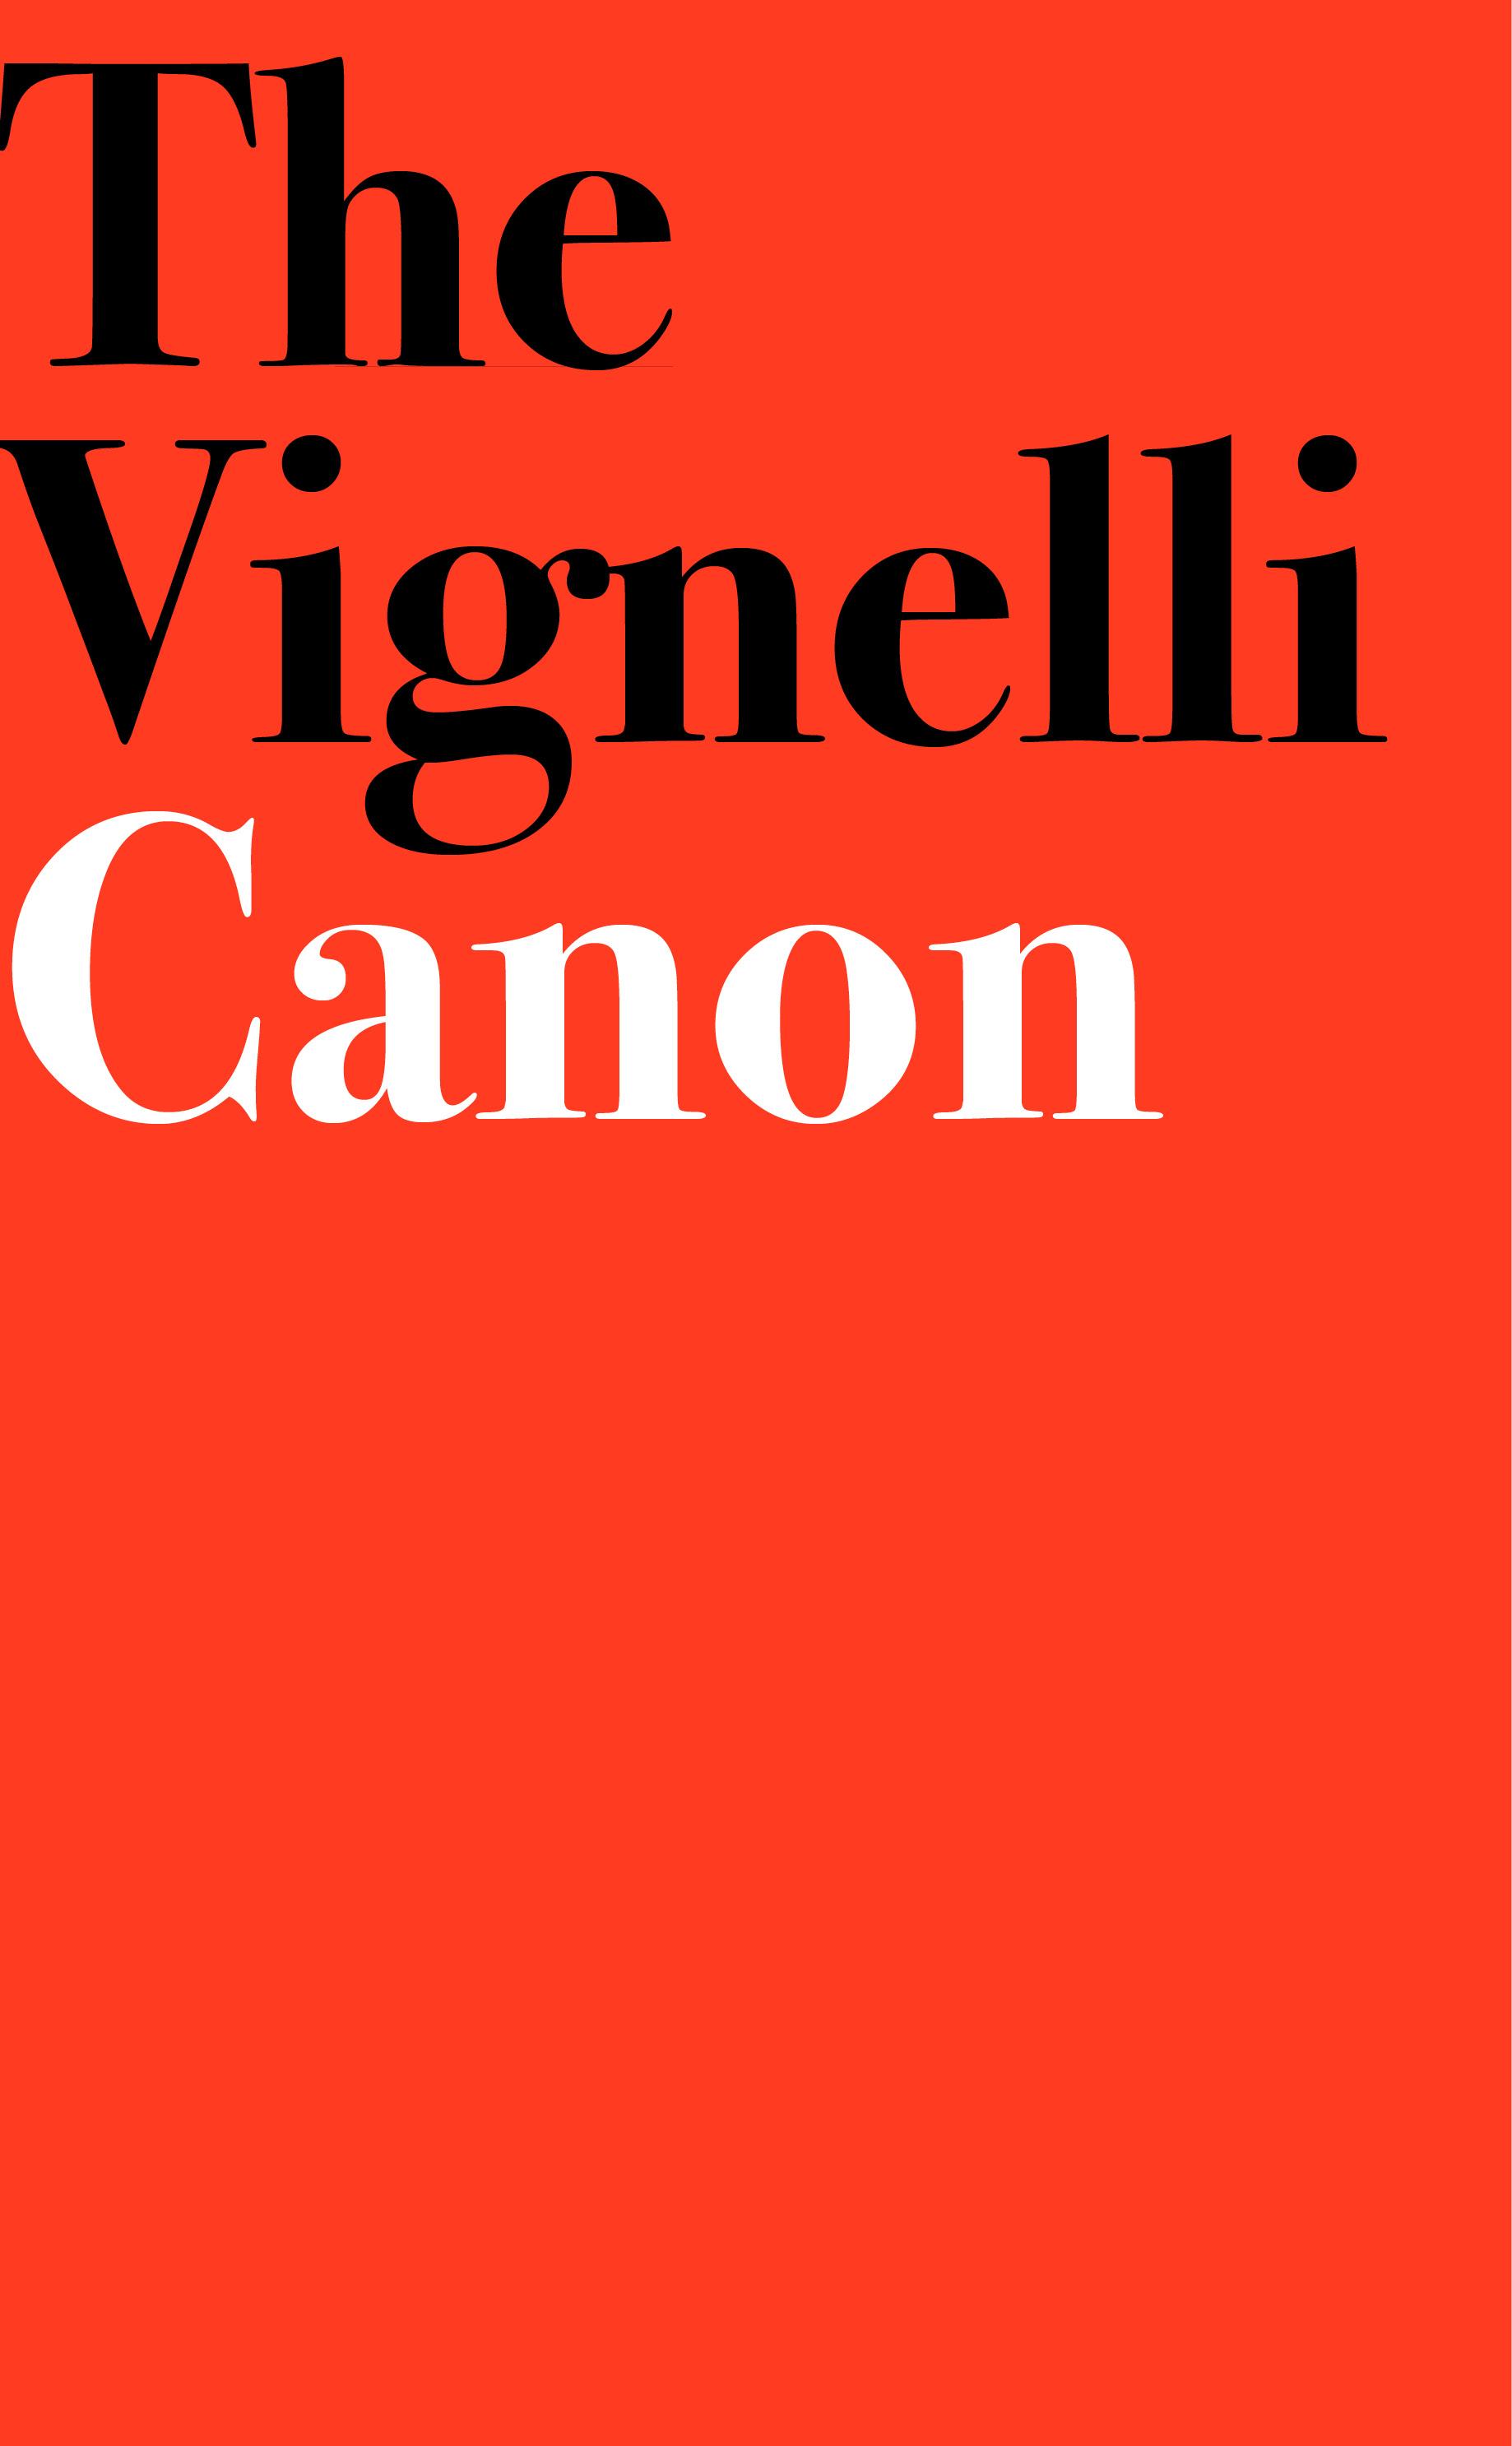 Vignelli_layouts.jpg